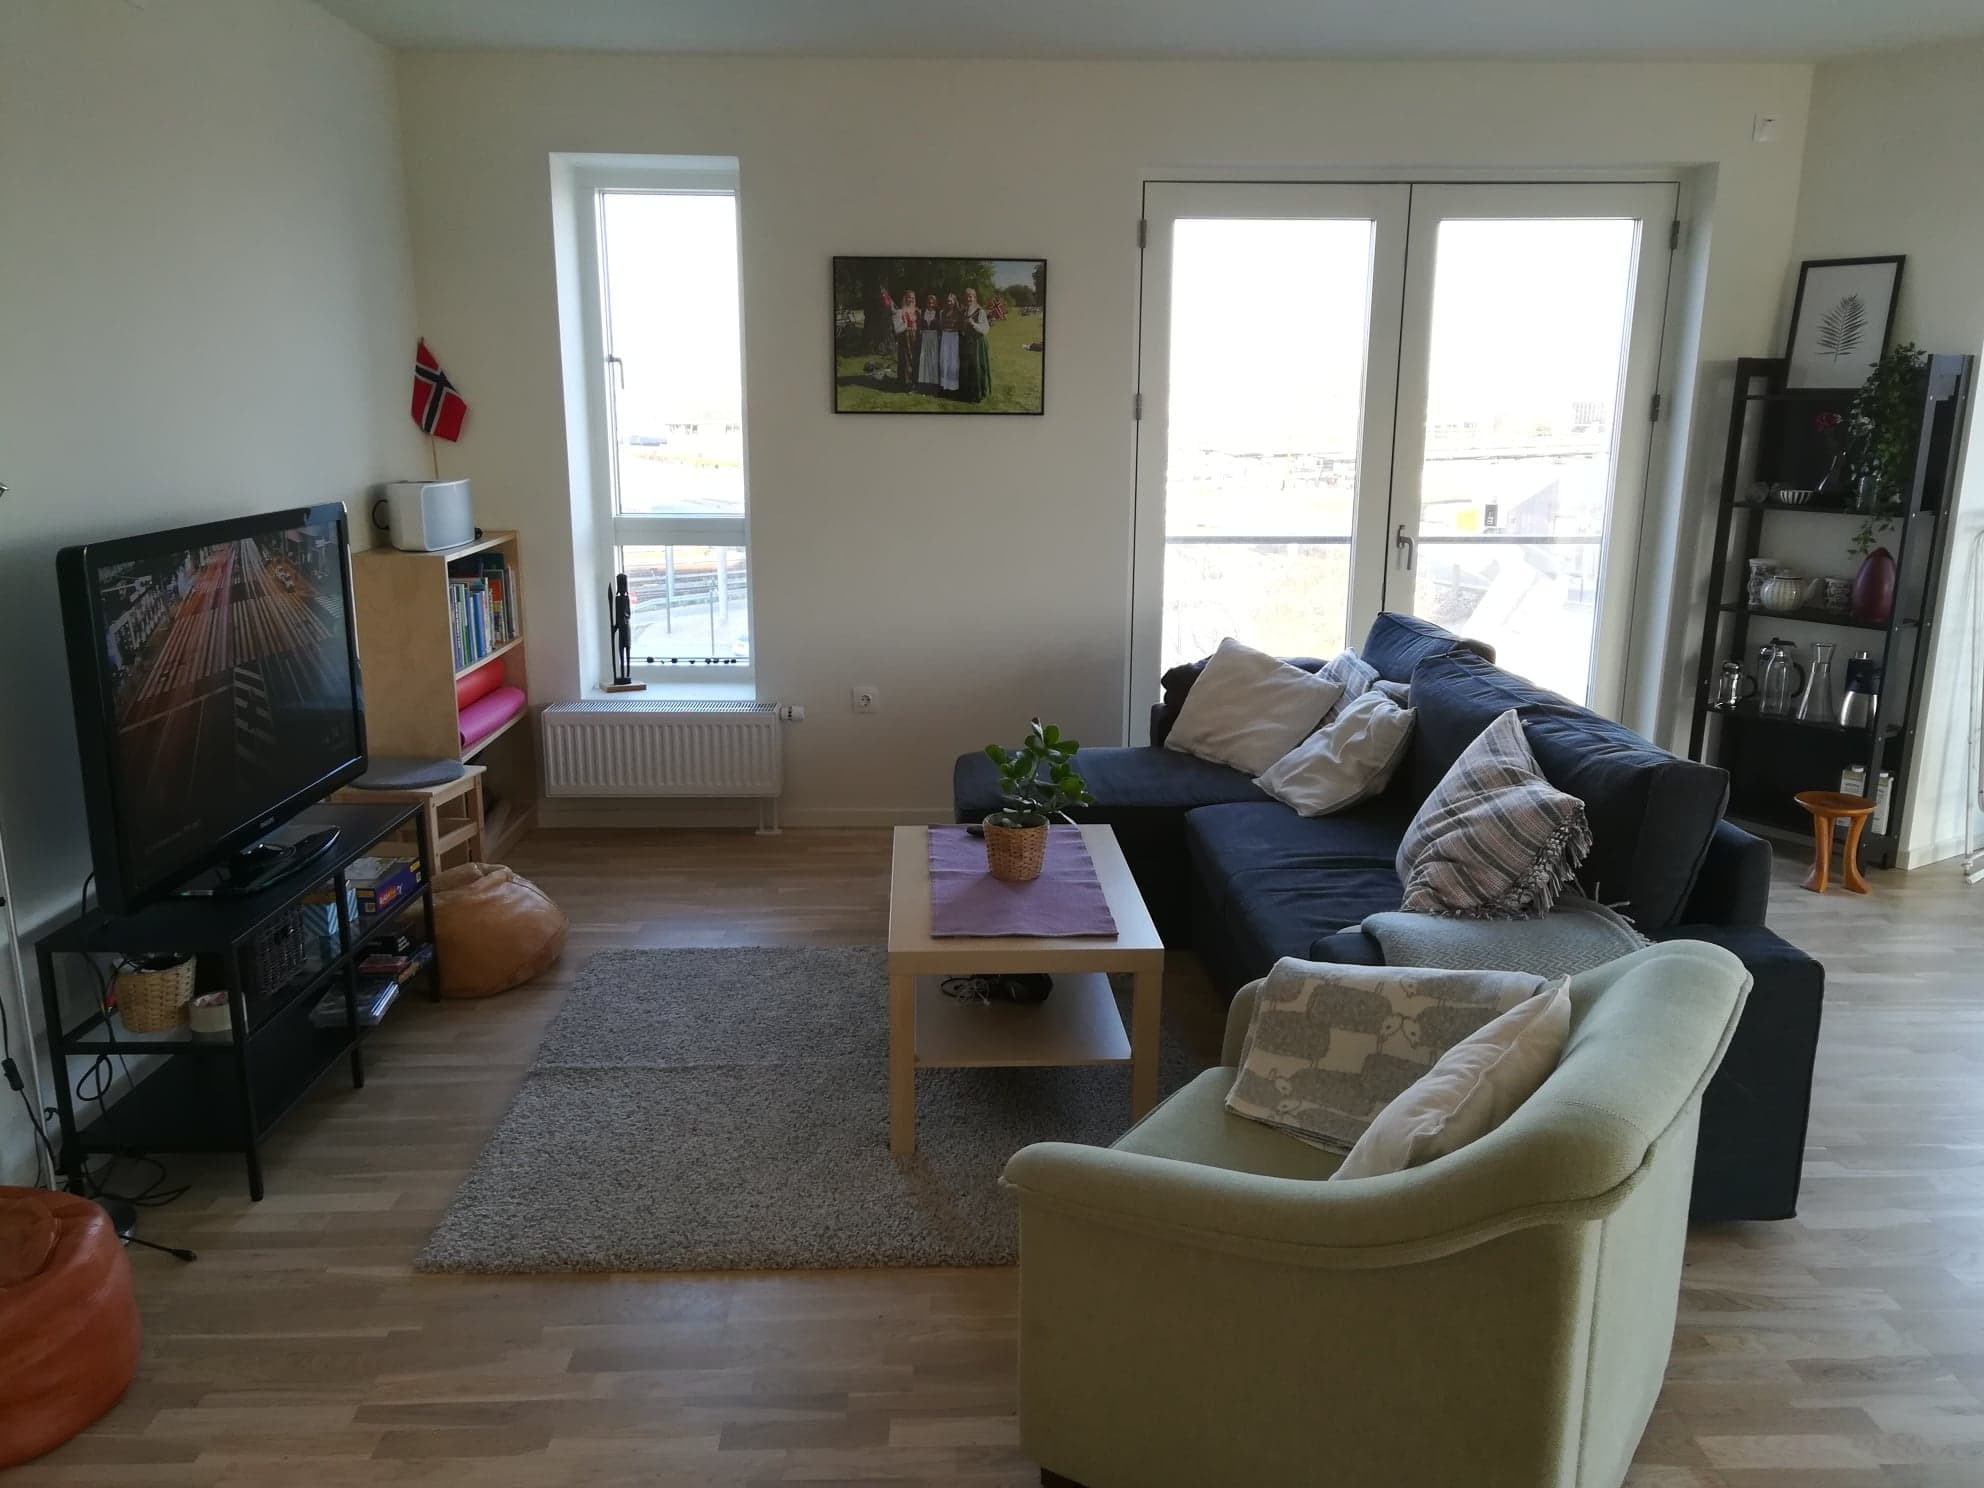 6-7 måneders fremleje av deilig værelse i Odense C! :) / 6-7 months sublet of lovely room in Odense C! :)